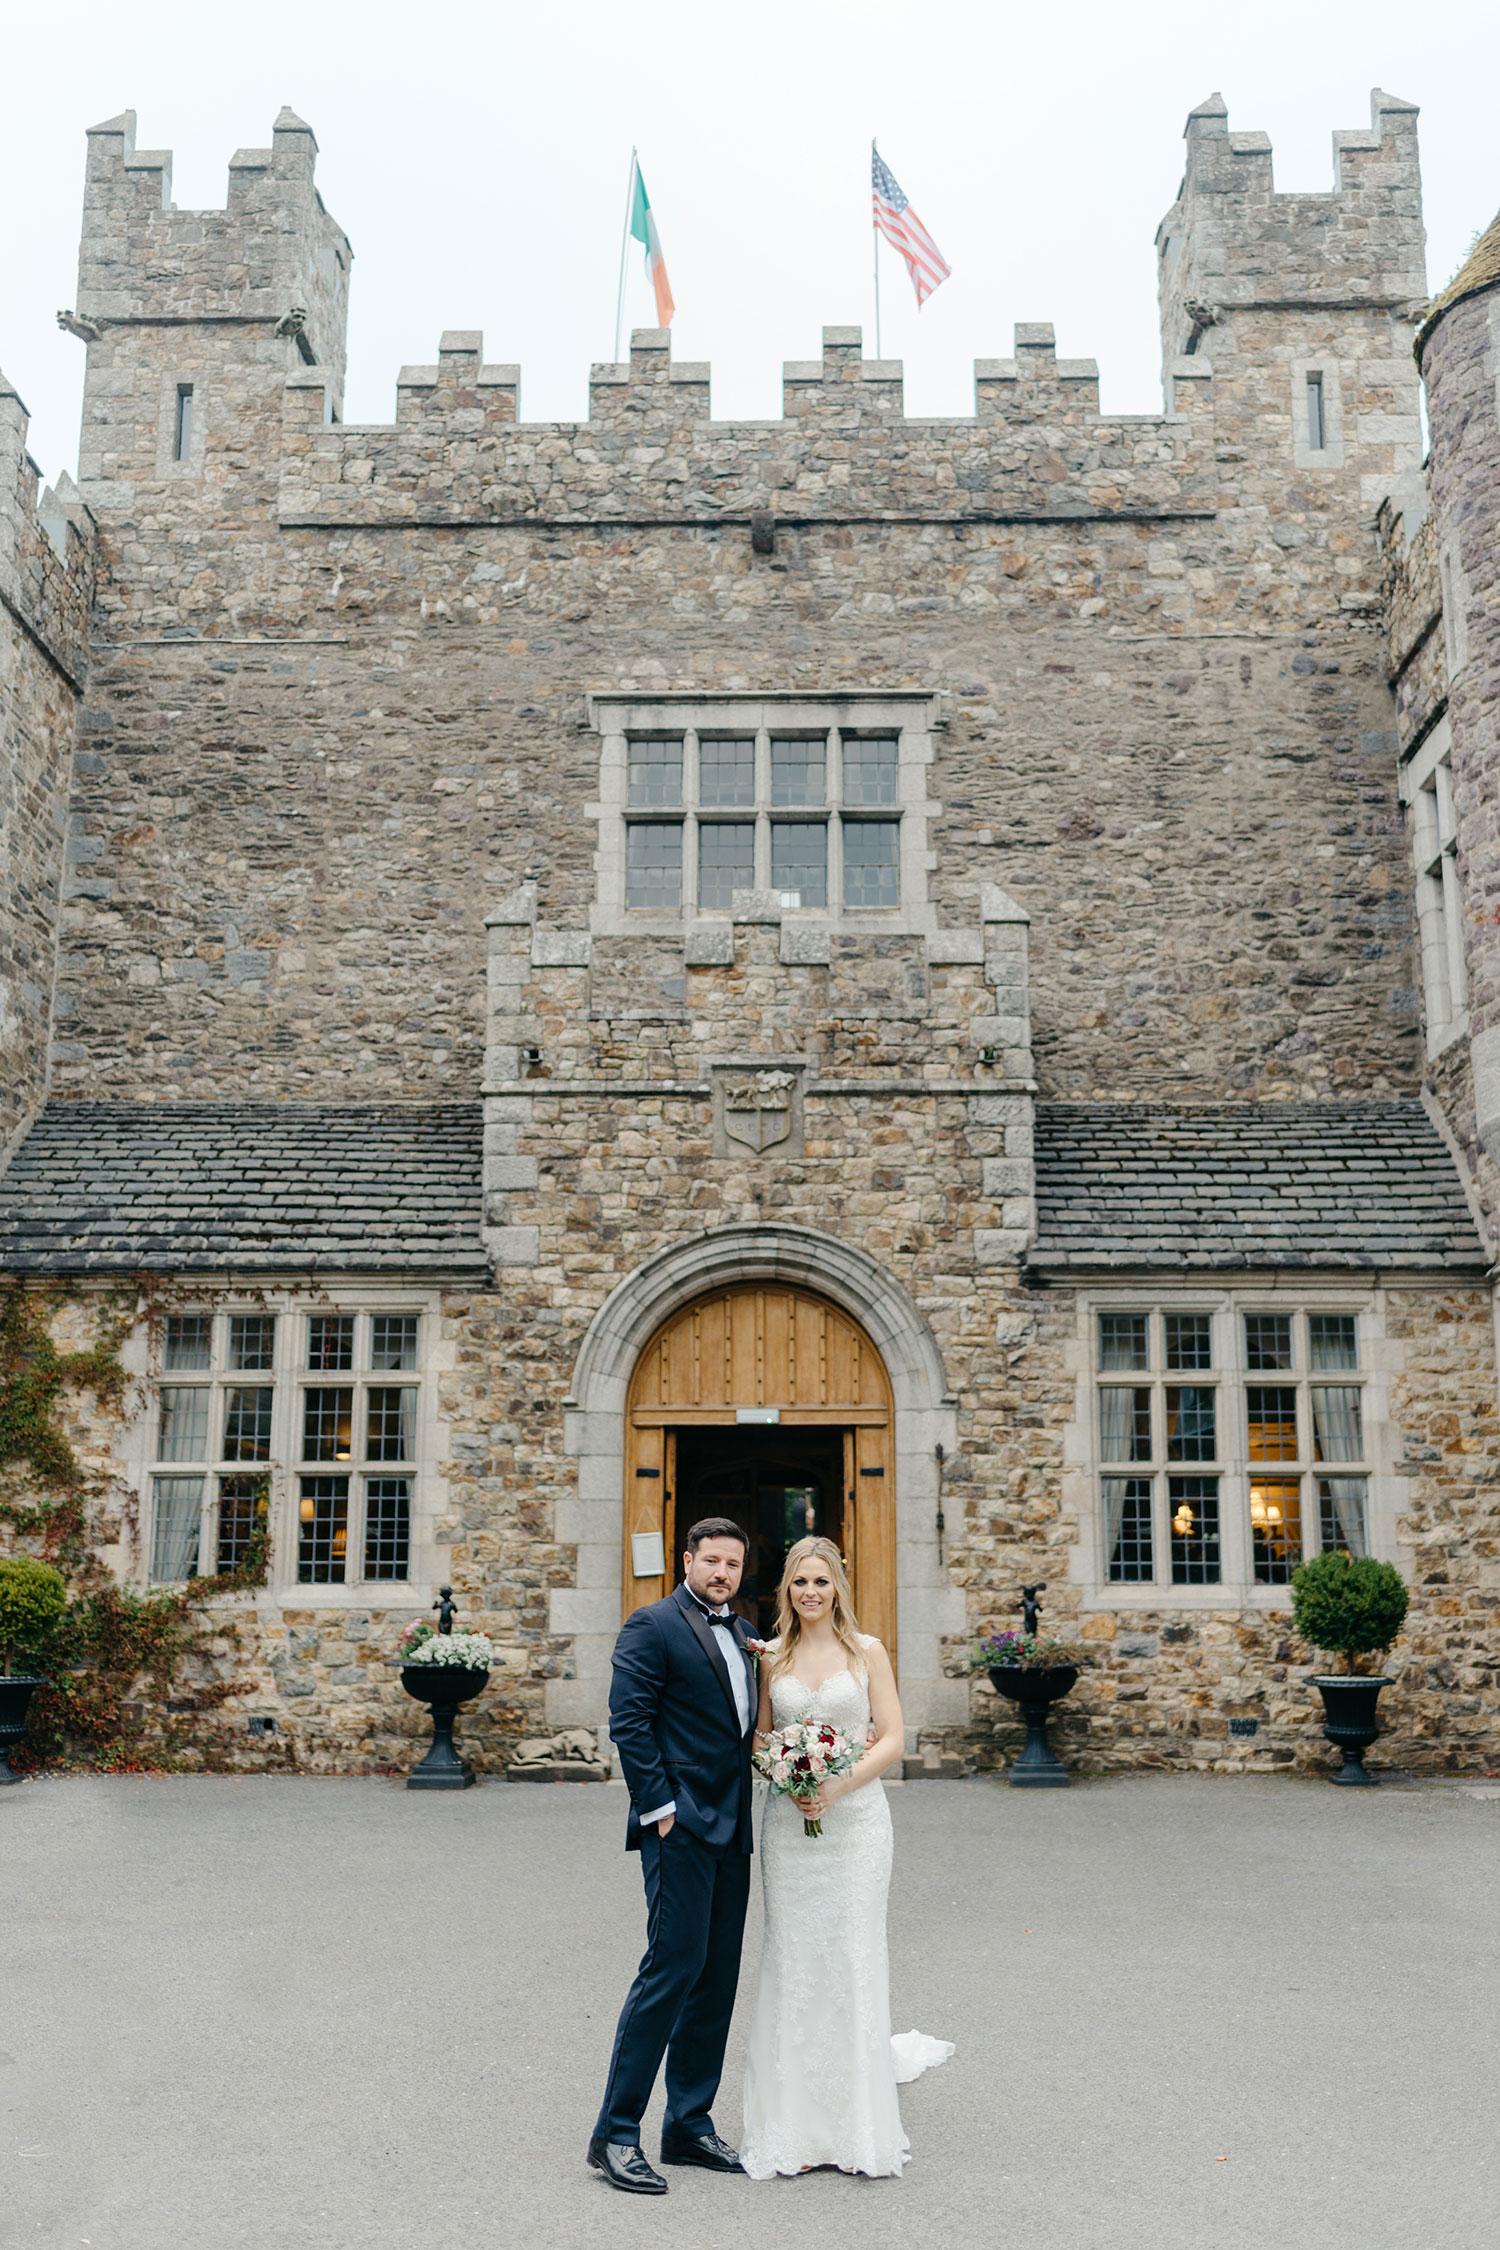 waterford-castle-wedding-photographer-0107_0107.jpg